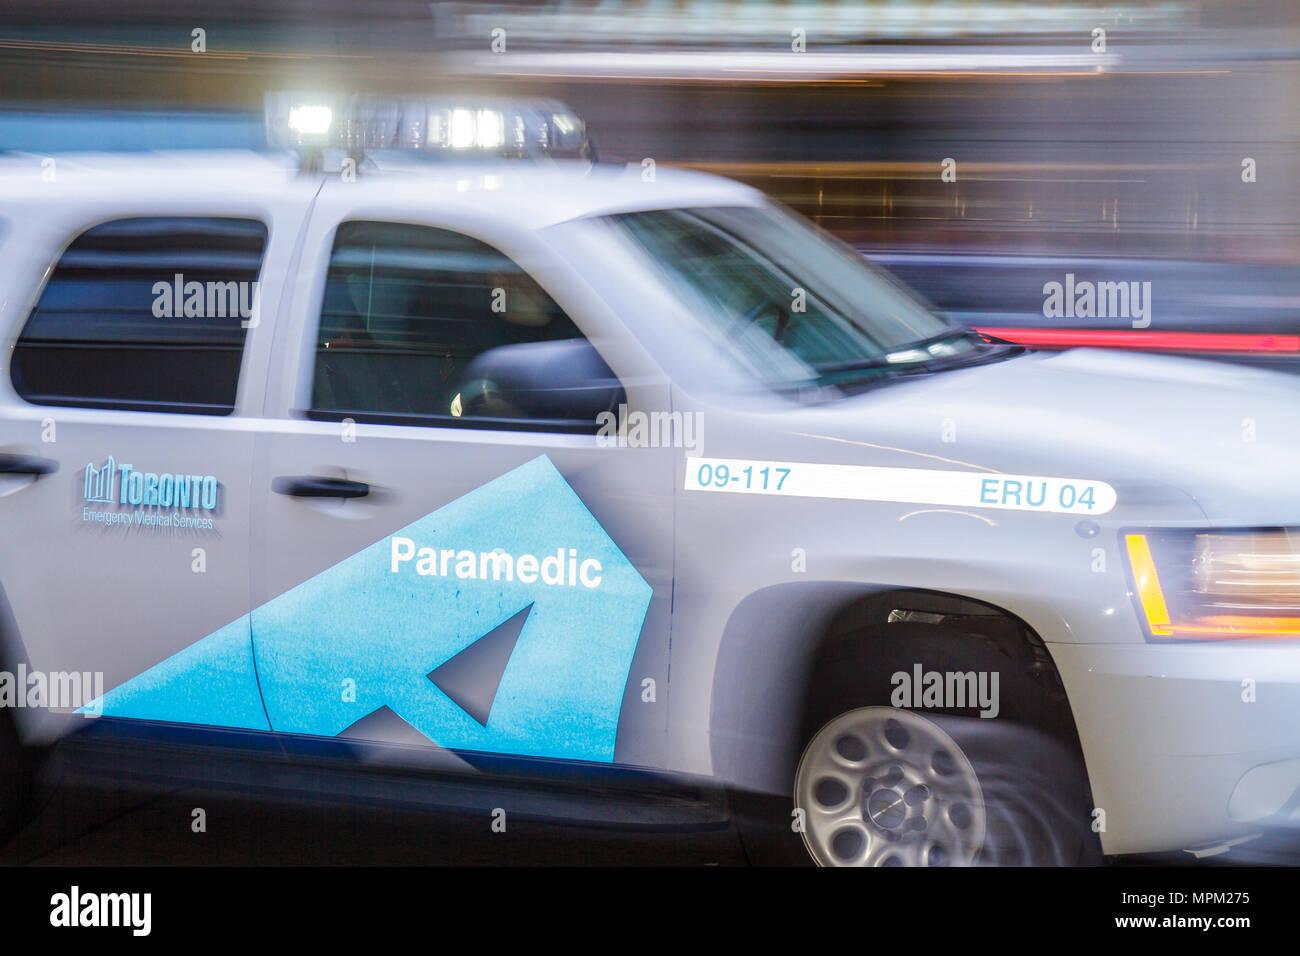 car flashing stock photos & car flashing stock images - alamy